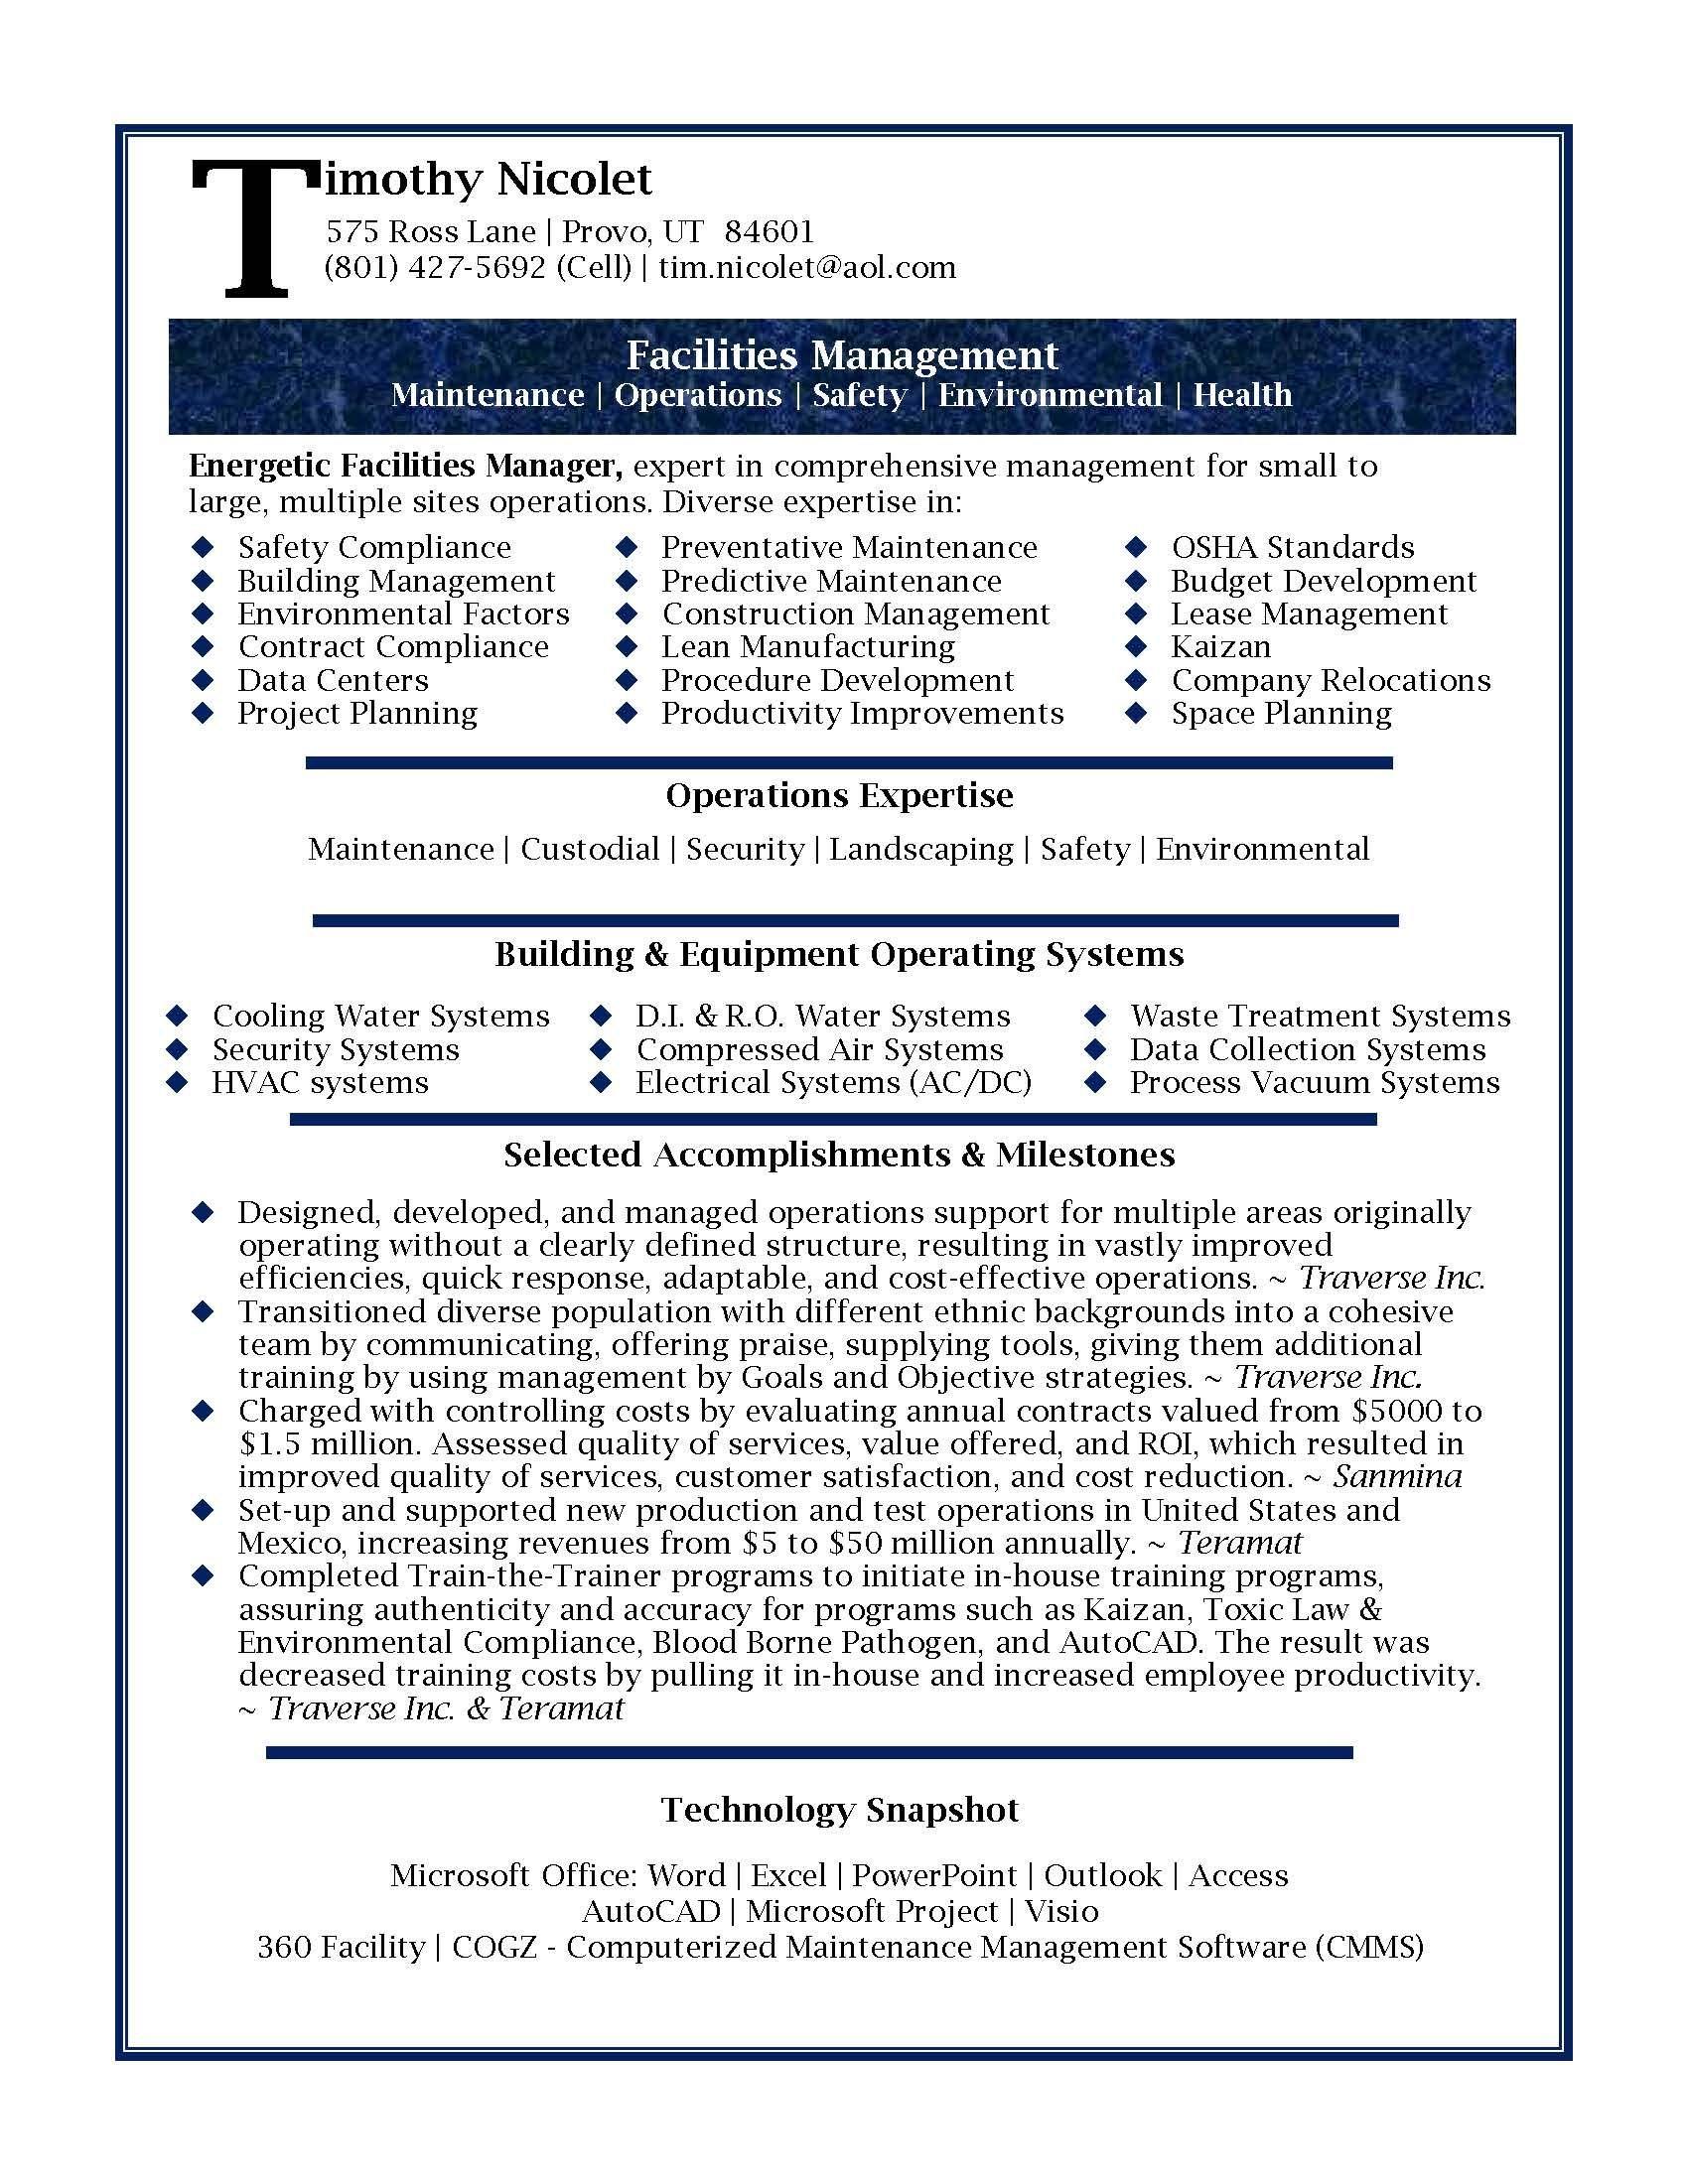 Management Objective Resume Prepossessing Professional Resume Samplesjulie Walraven Cmrw  Professional .